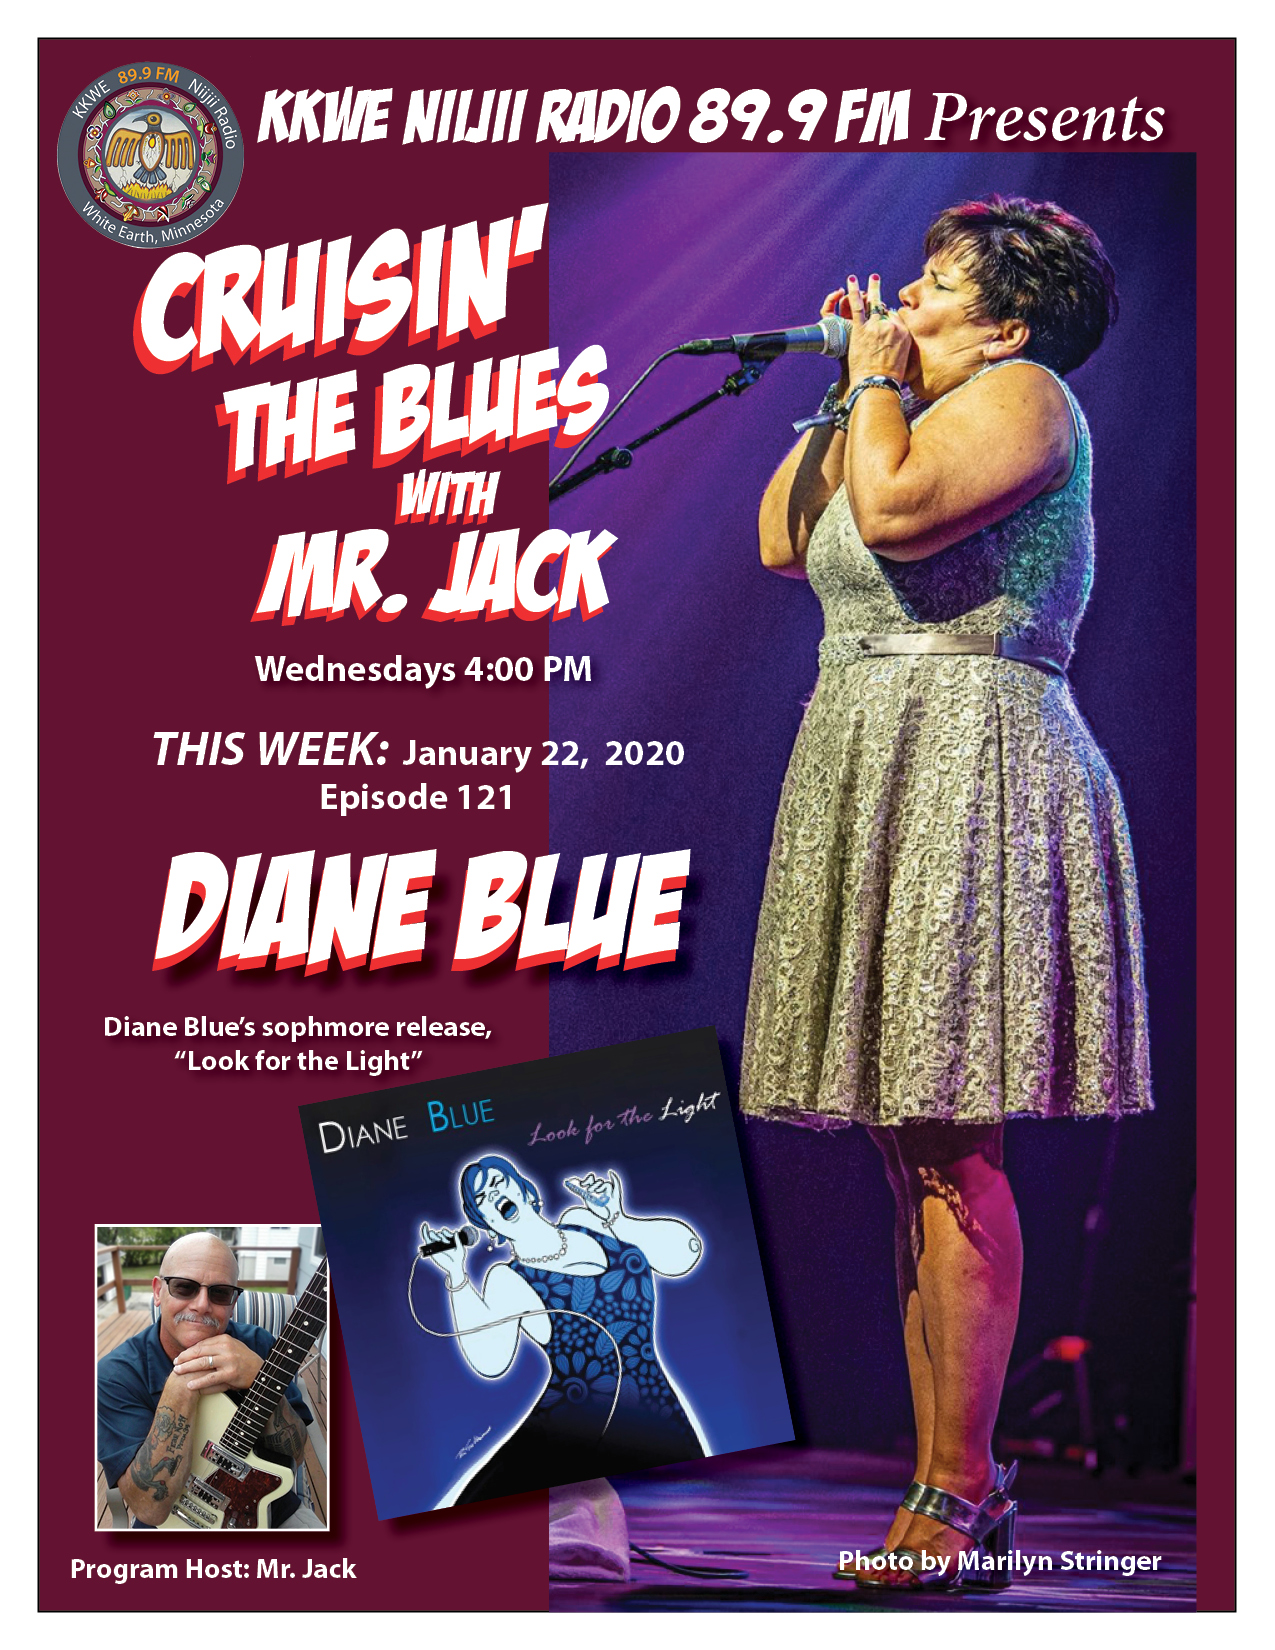 EP121 Diane Blue